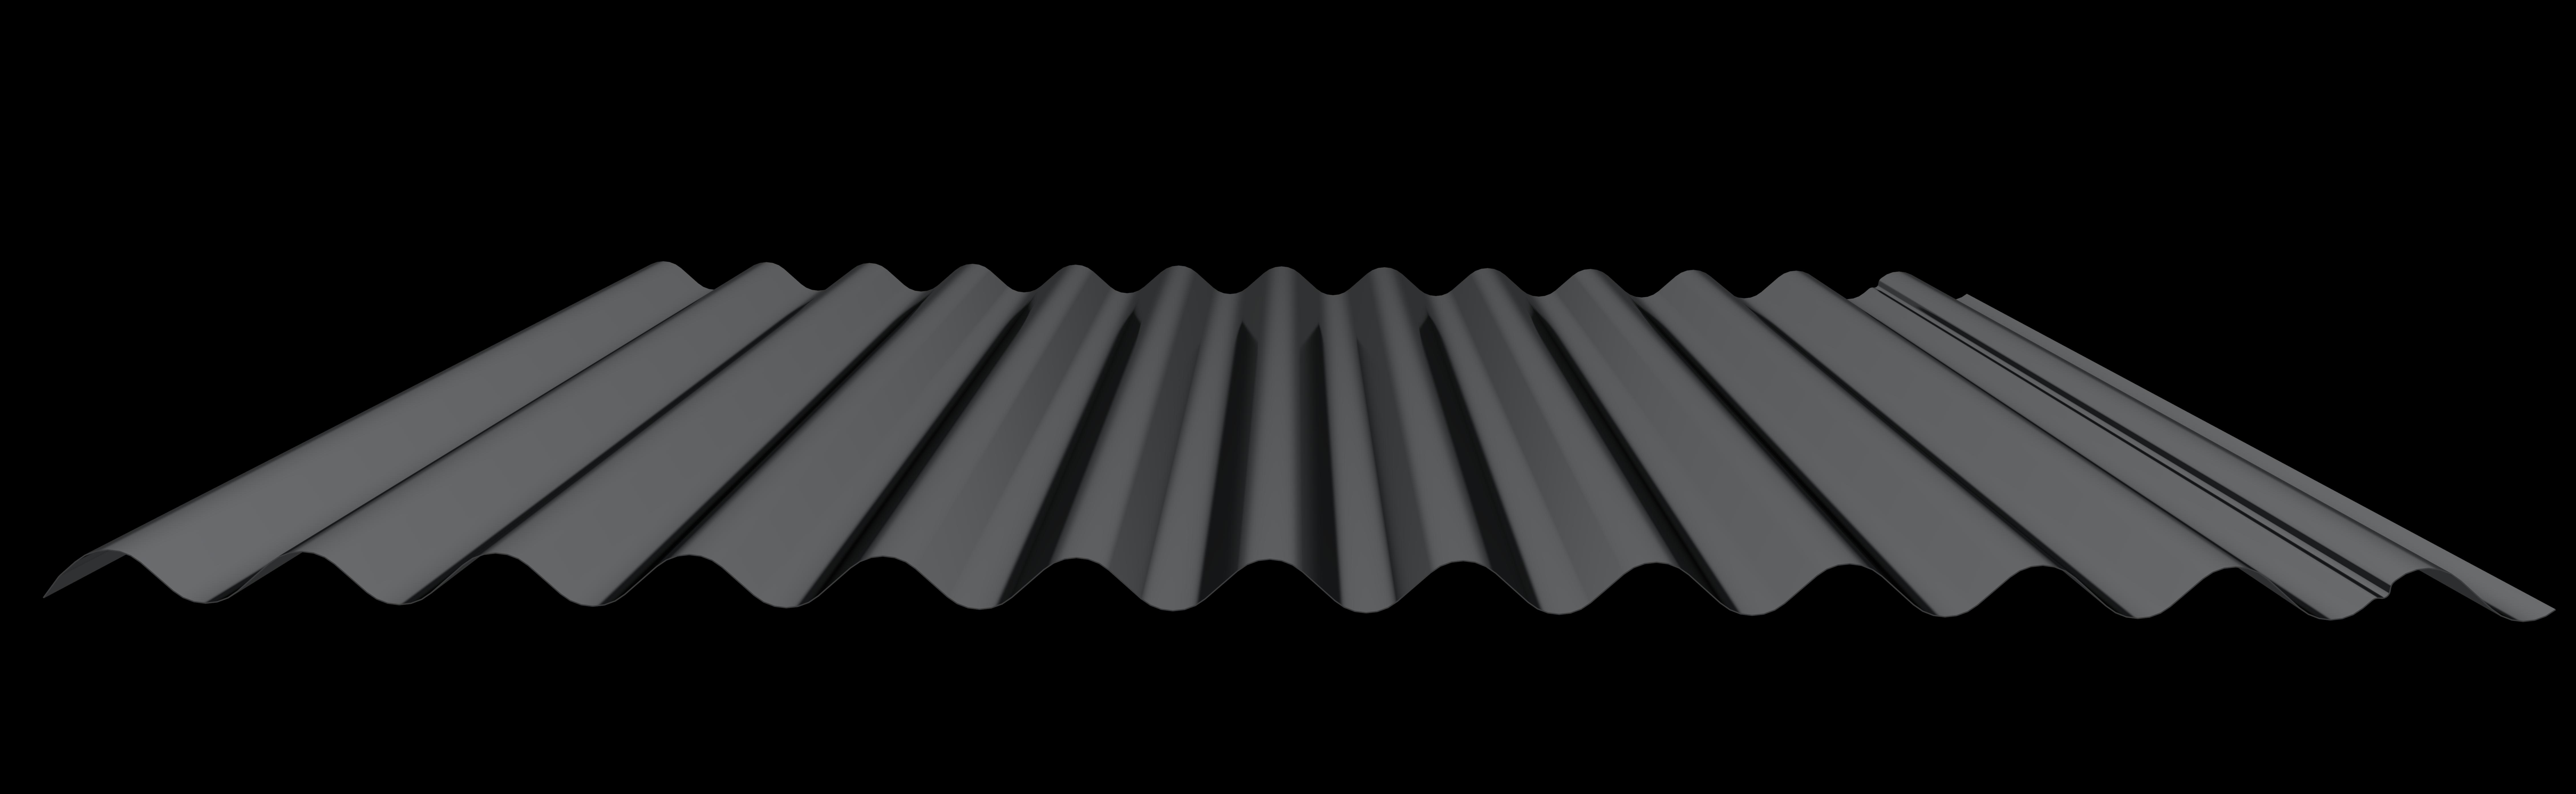 Three Quarter Corrugated cropped